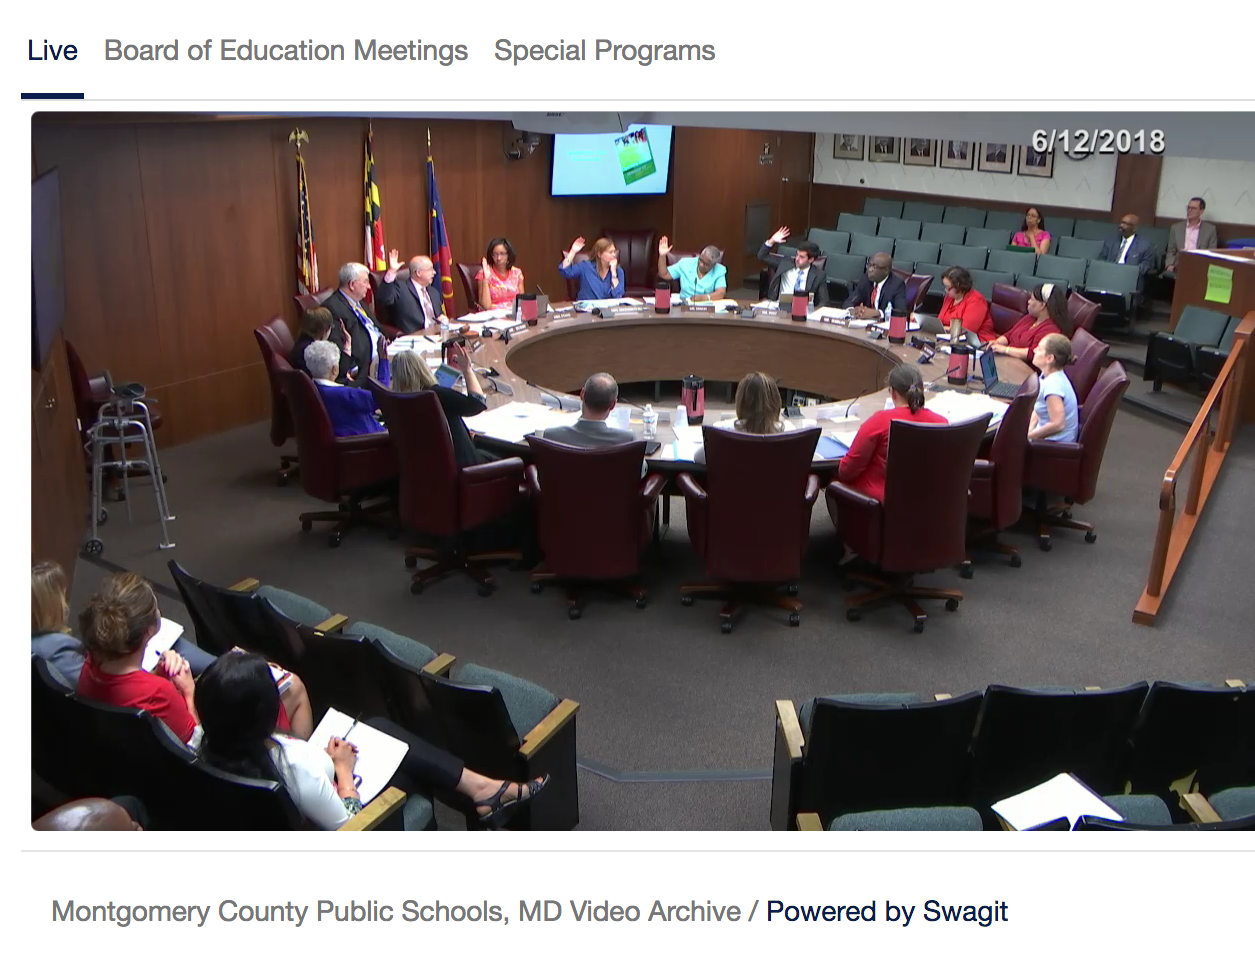 Screenshot-2018-6-12 BOE Meeting - Montgomery County Public Schools, Rockville, MD(8).png